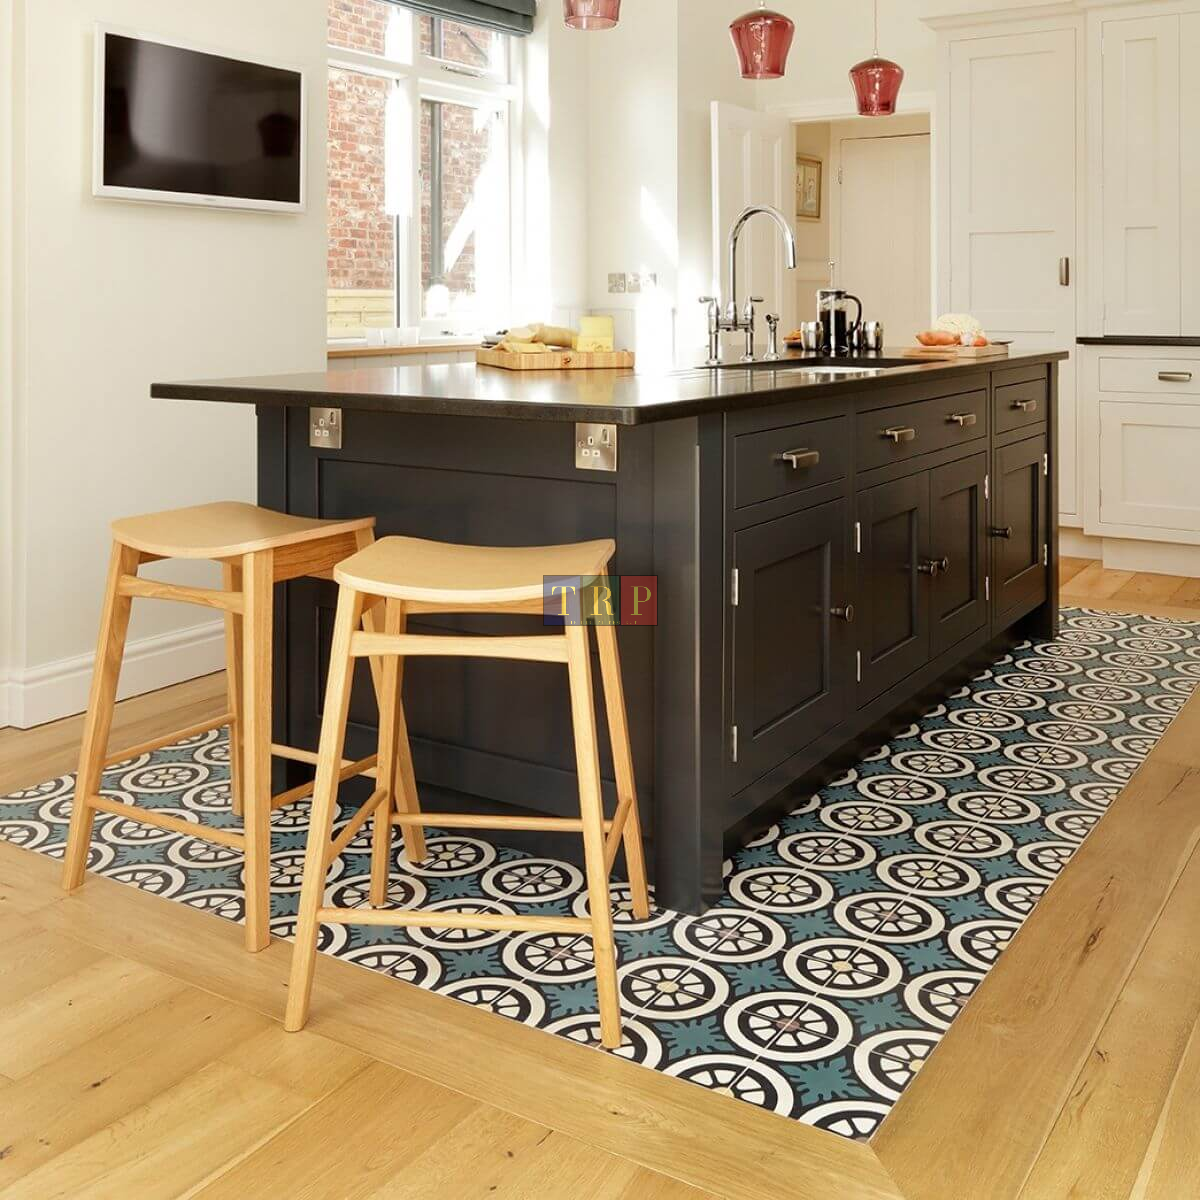 9+ Kitchen Floor Tile Ideas Best of Remodeling Kitchen Tiles in ...